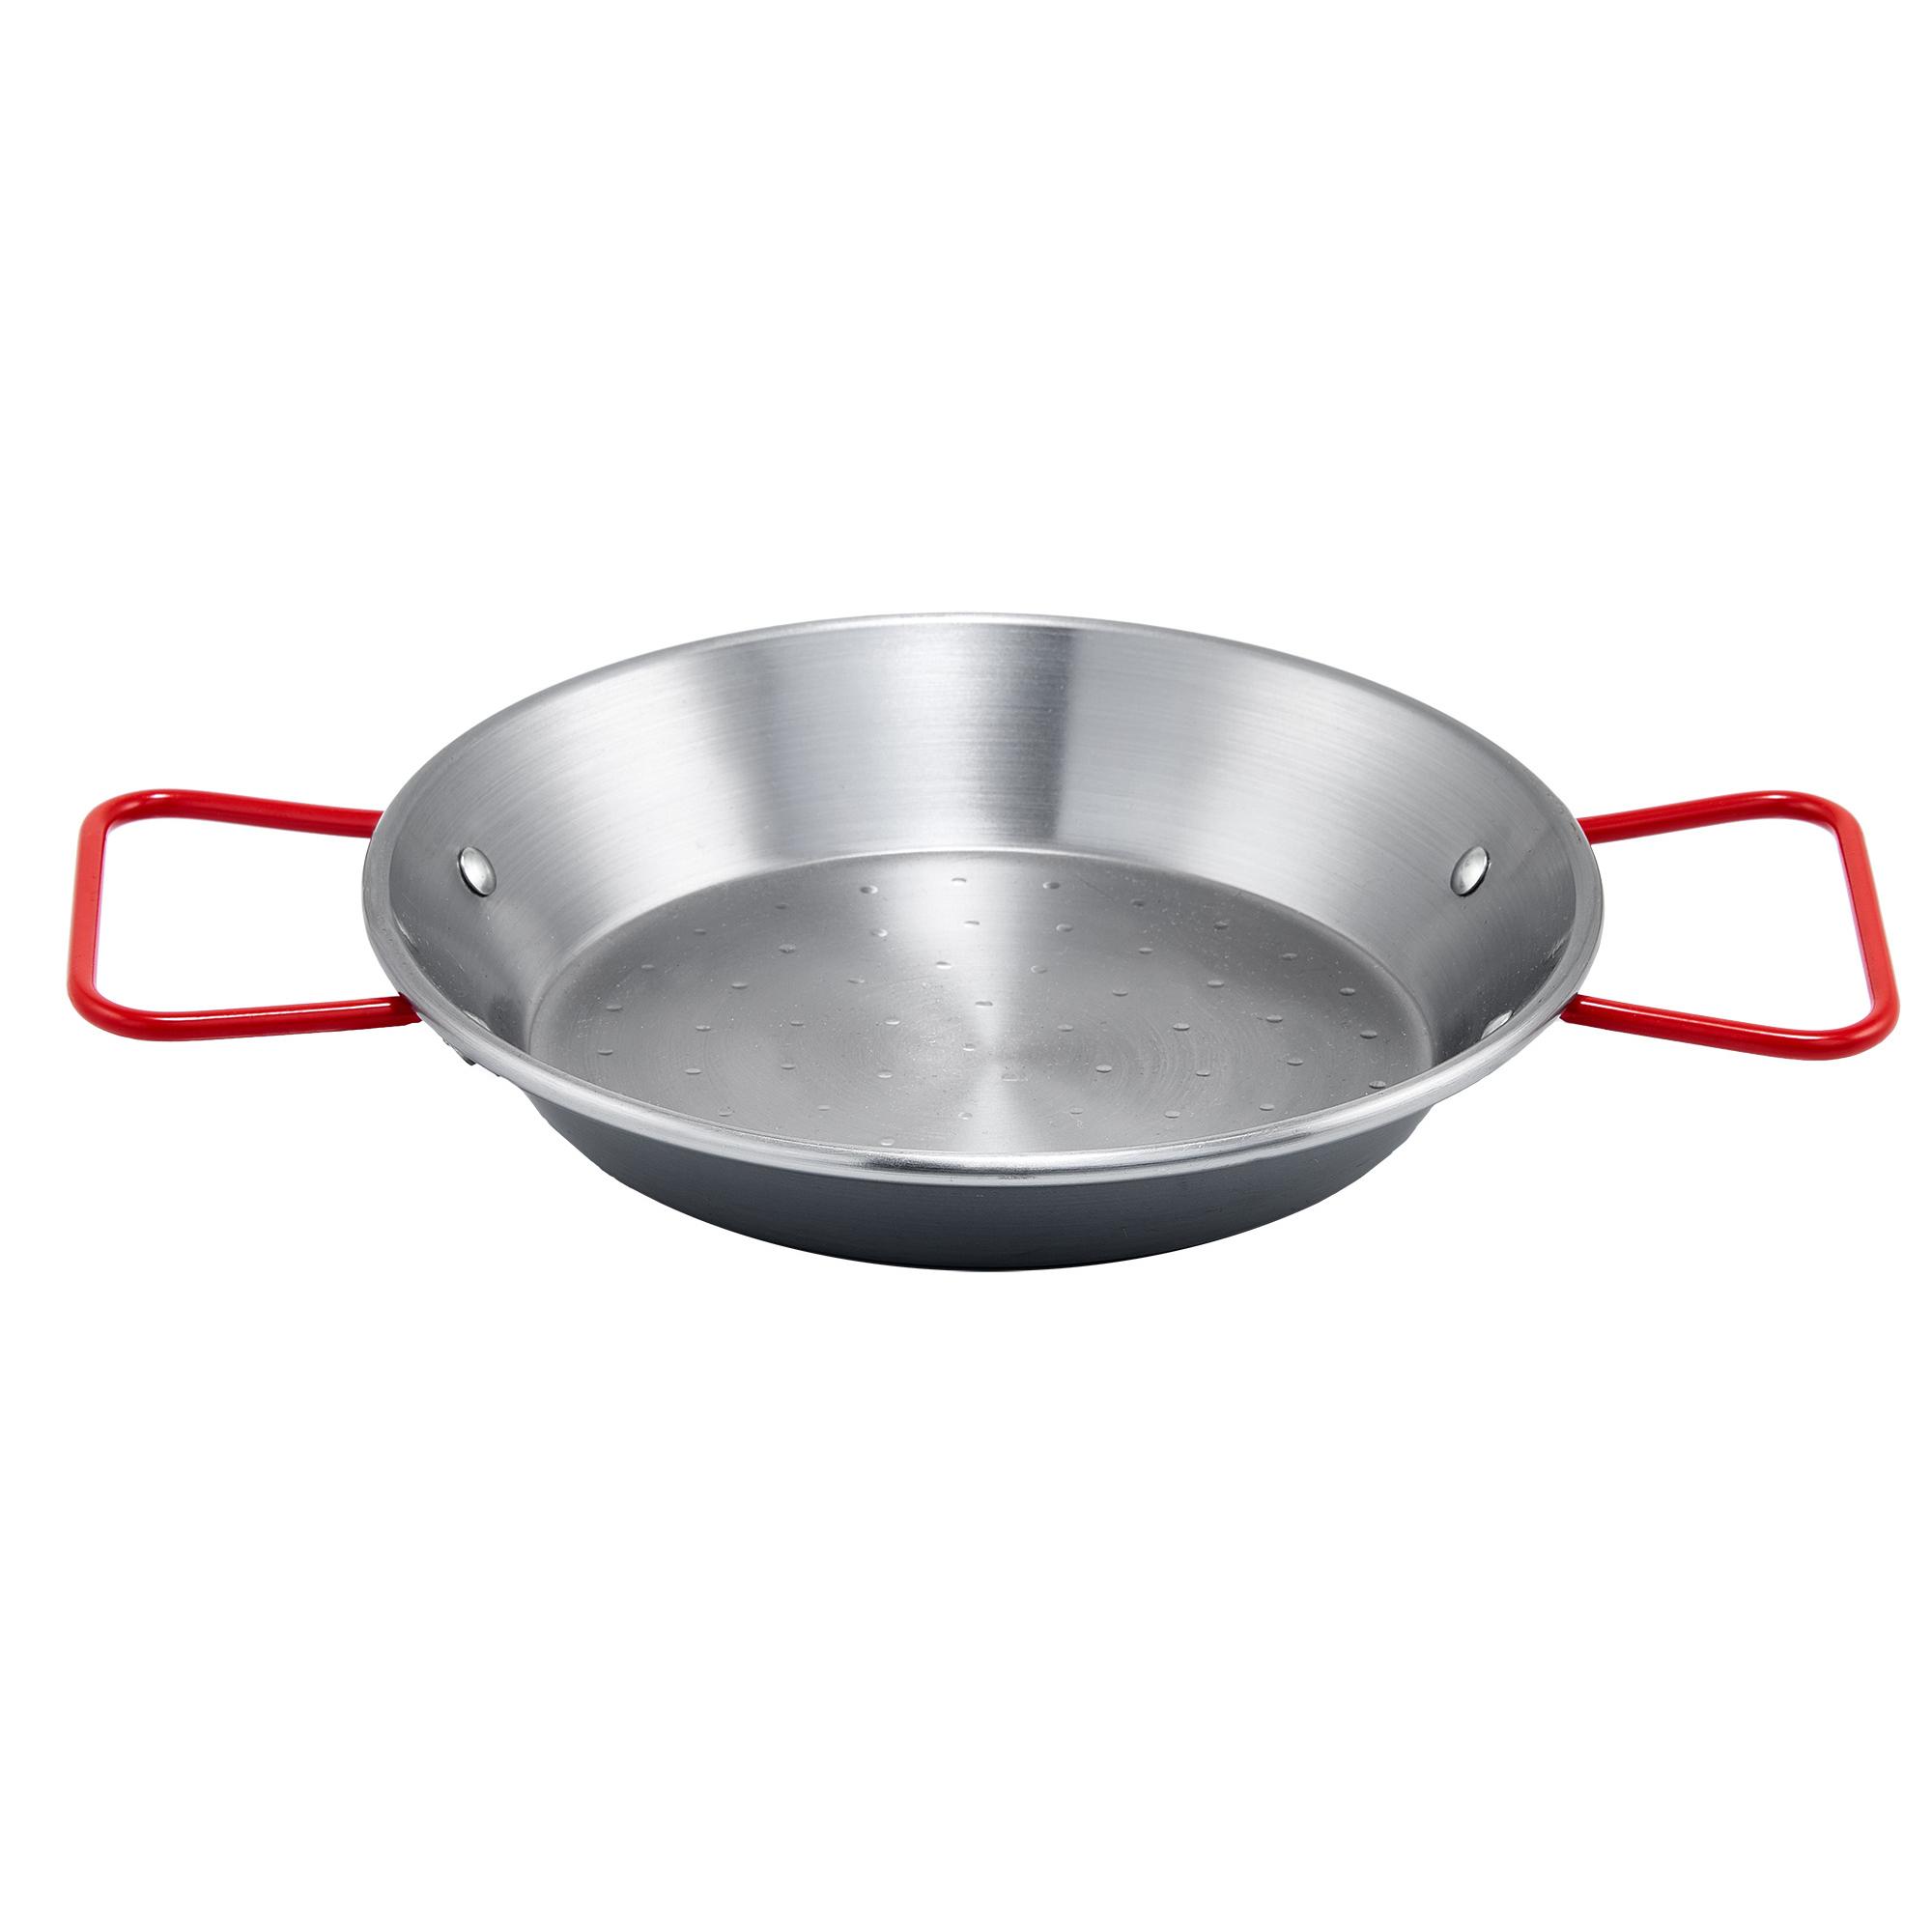 Winco CSPP-23 paella pan